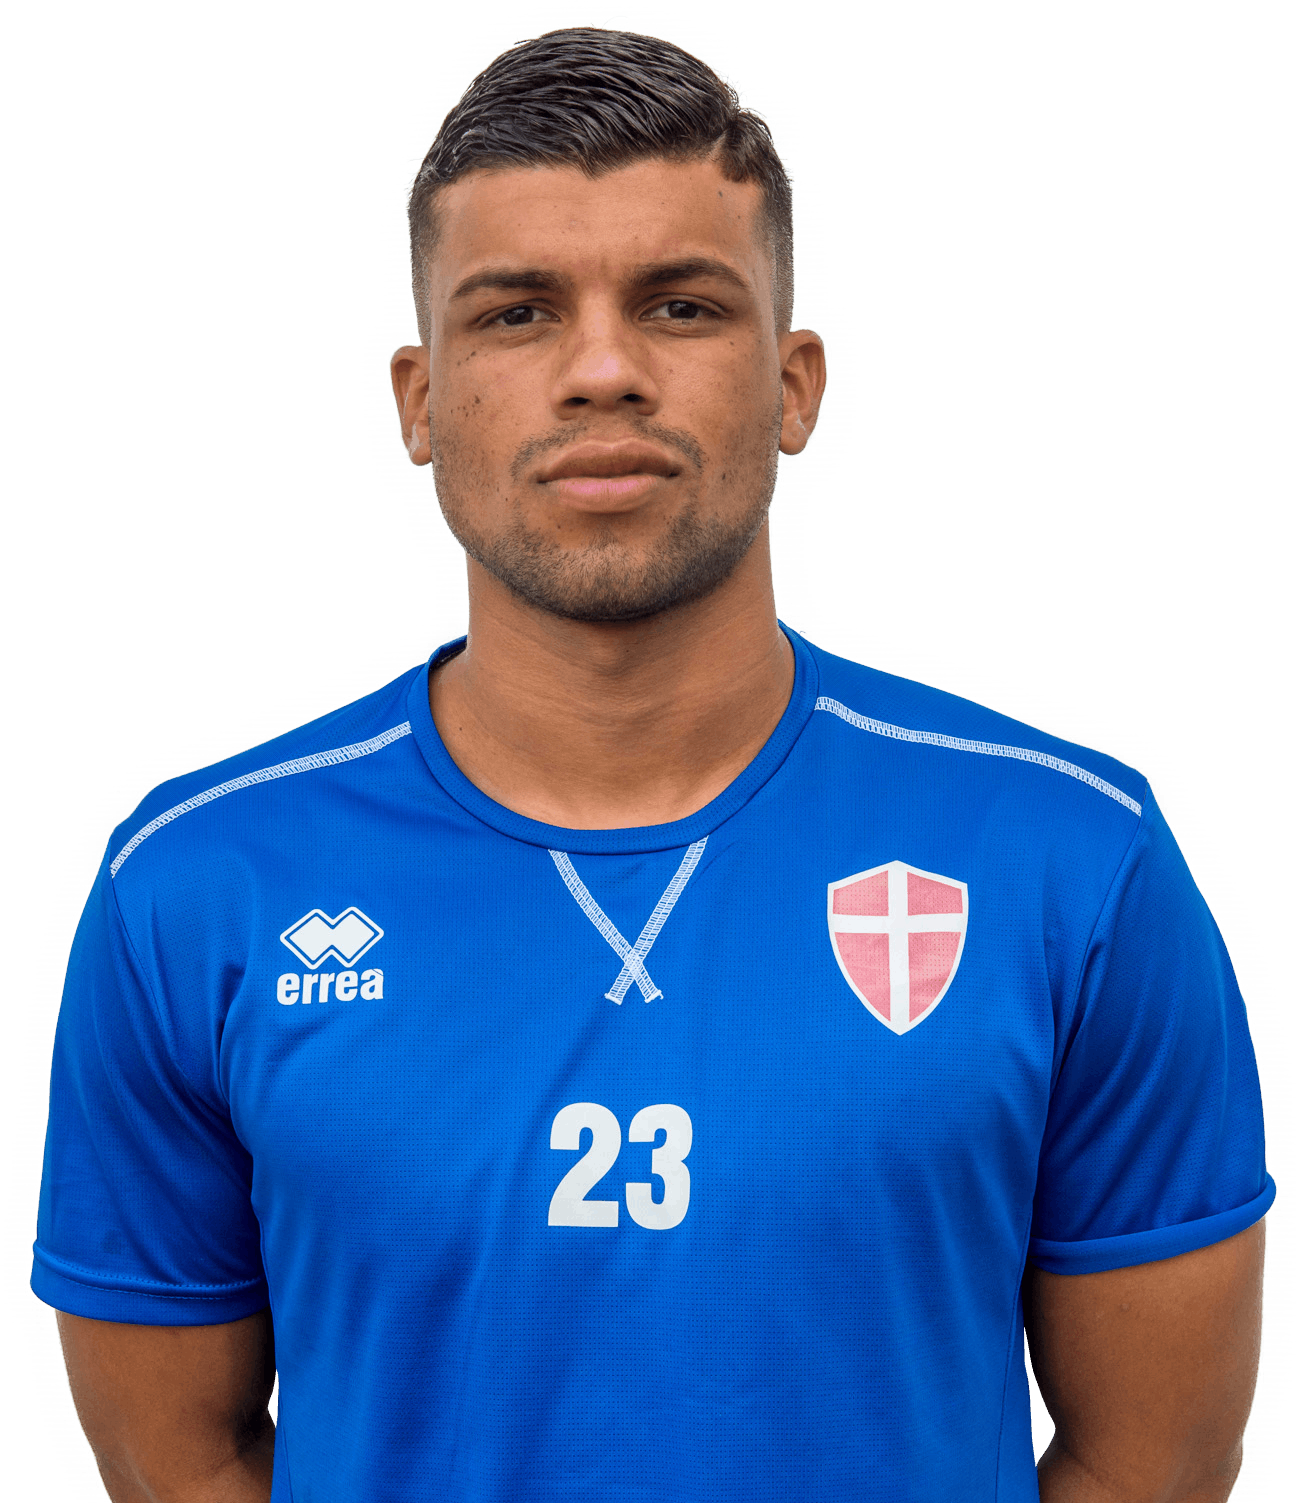 You are currently viewing Leonardo Pereira